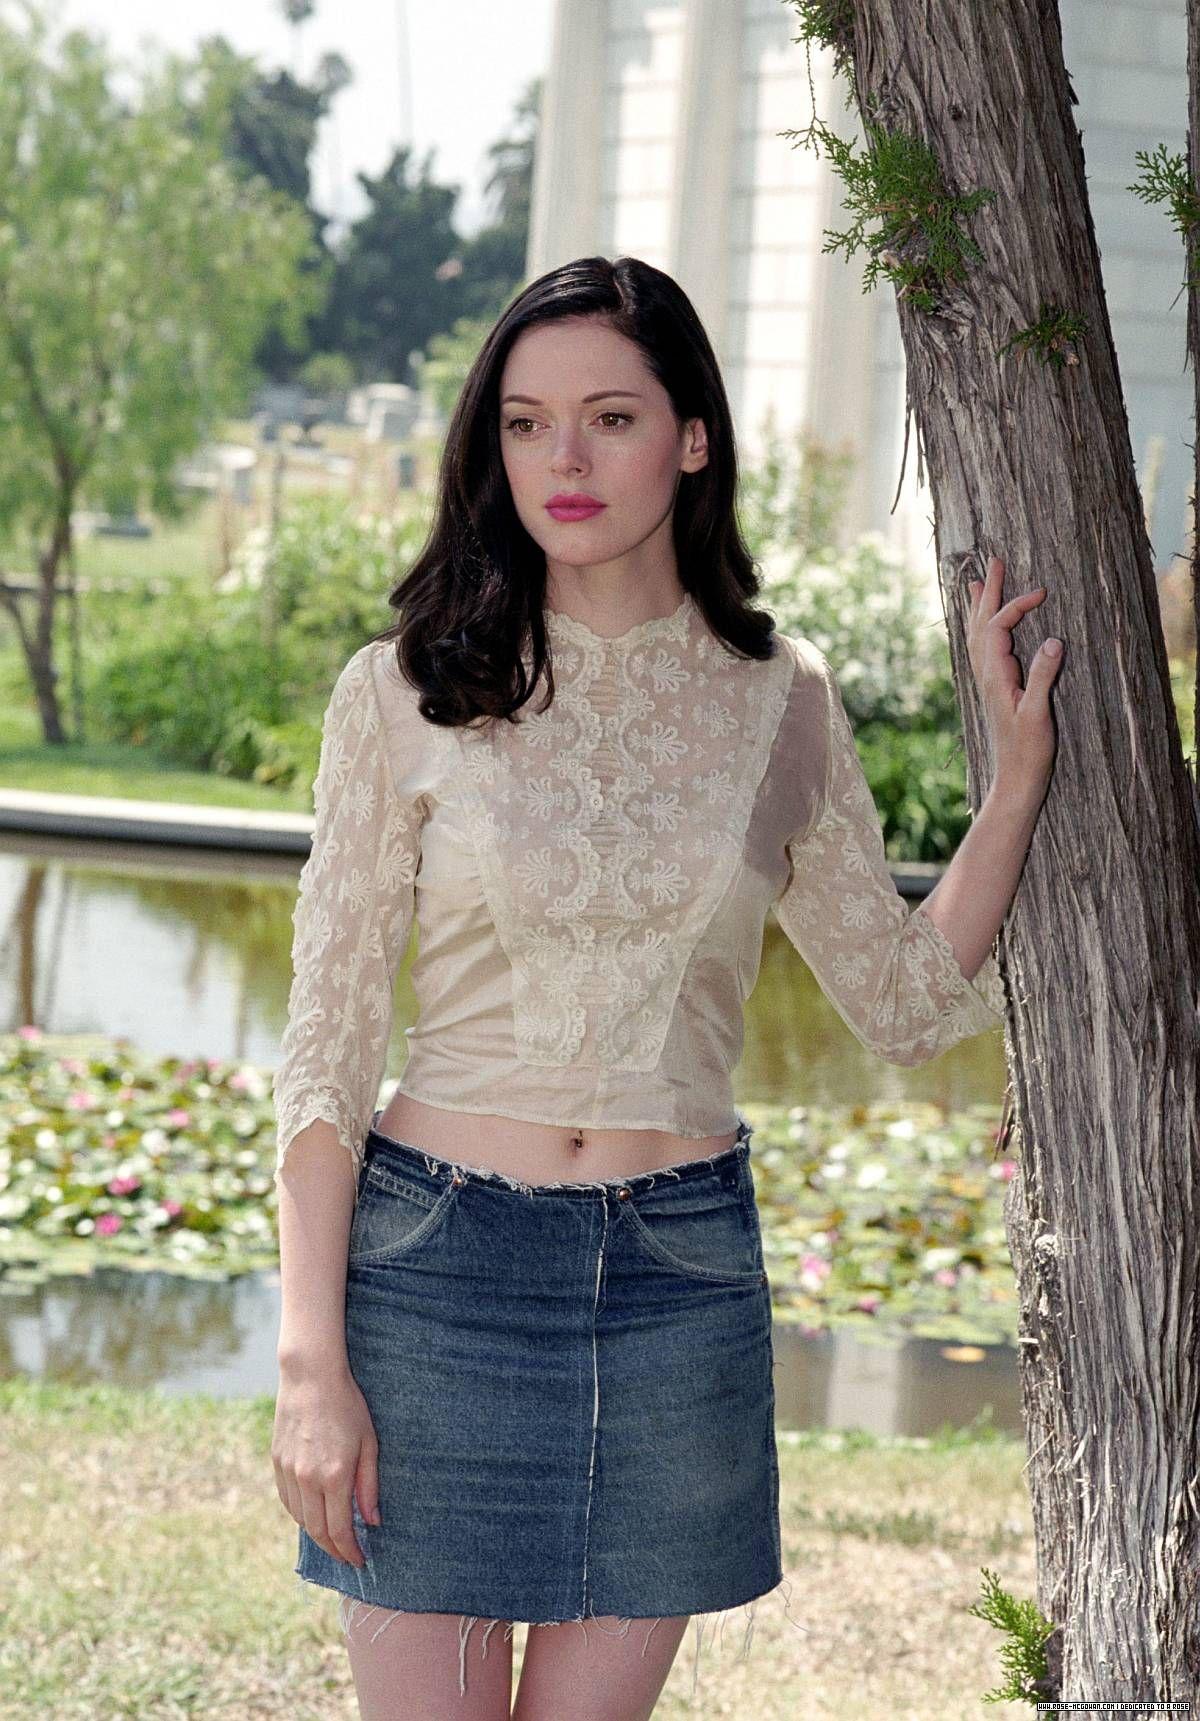 Rose McGowan is Paige Matthews in Charmed